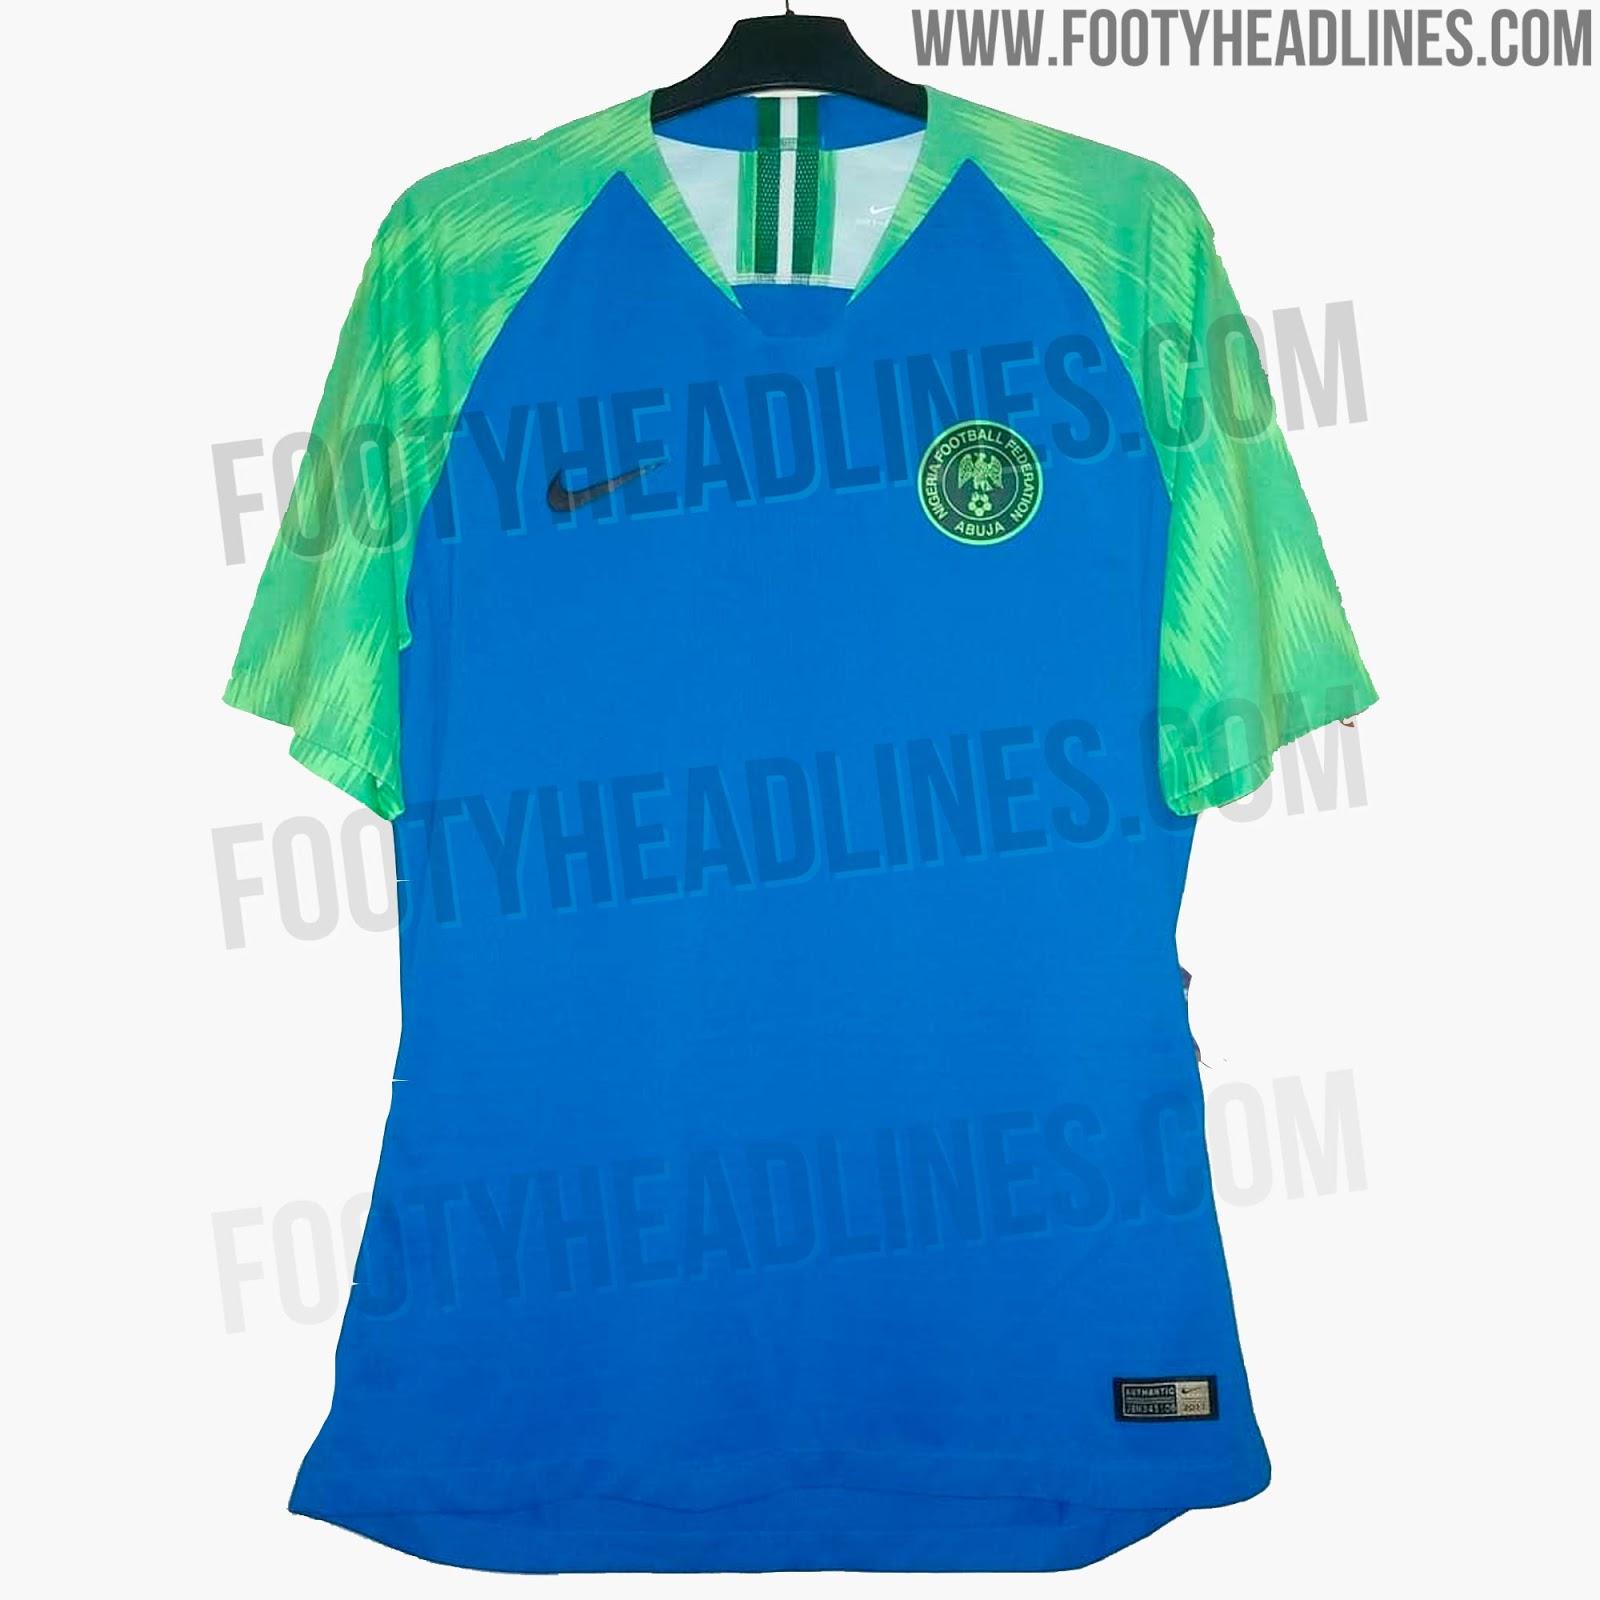 Camiseta Crazy Nike Nigeria 2018 World Cup Prototipo-Filtrada